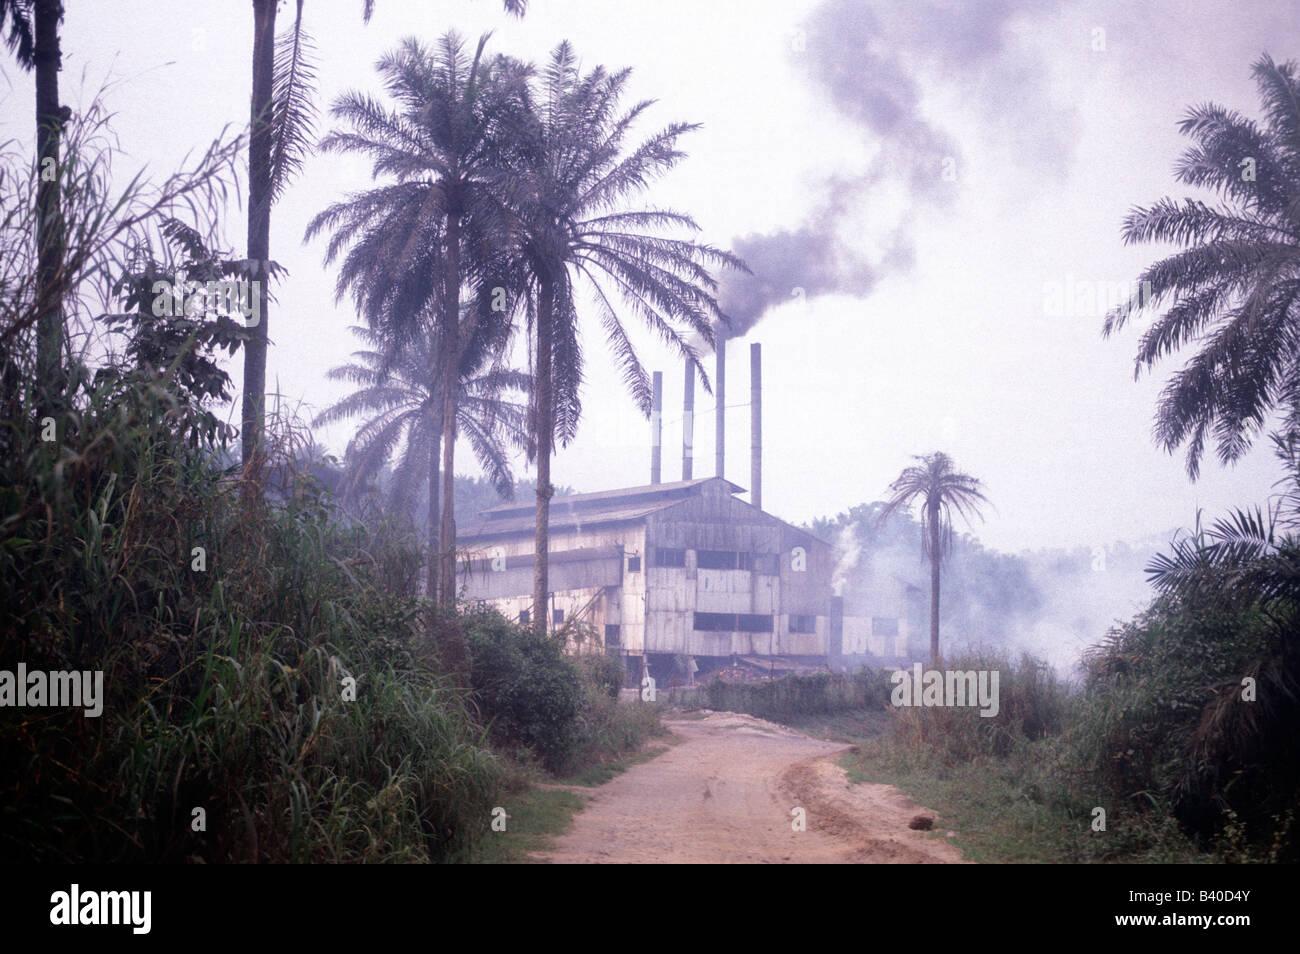 Unilever oil palm processing Kasai region Democratic Republic of Congo - Stock Image